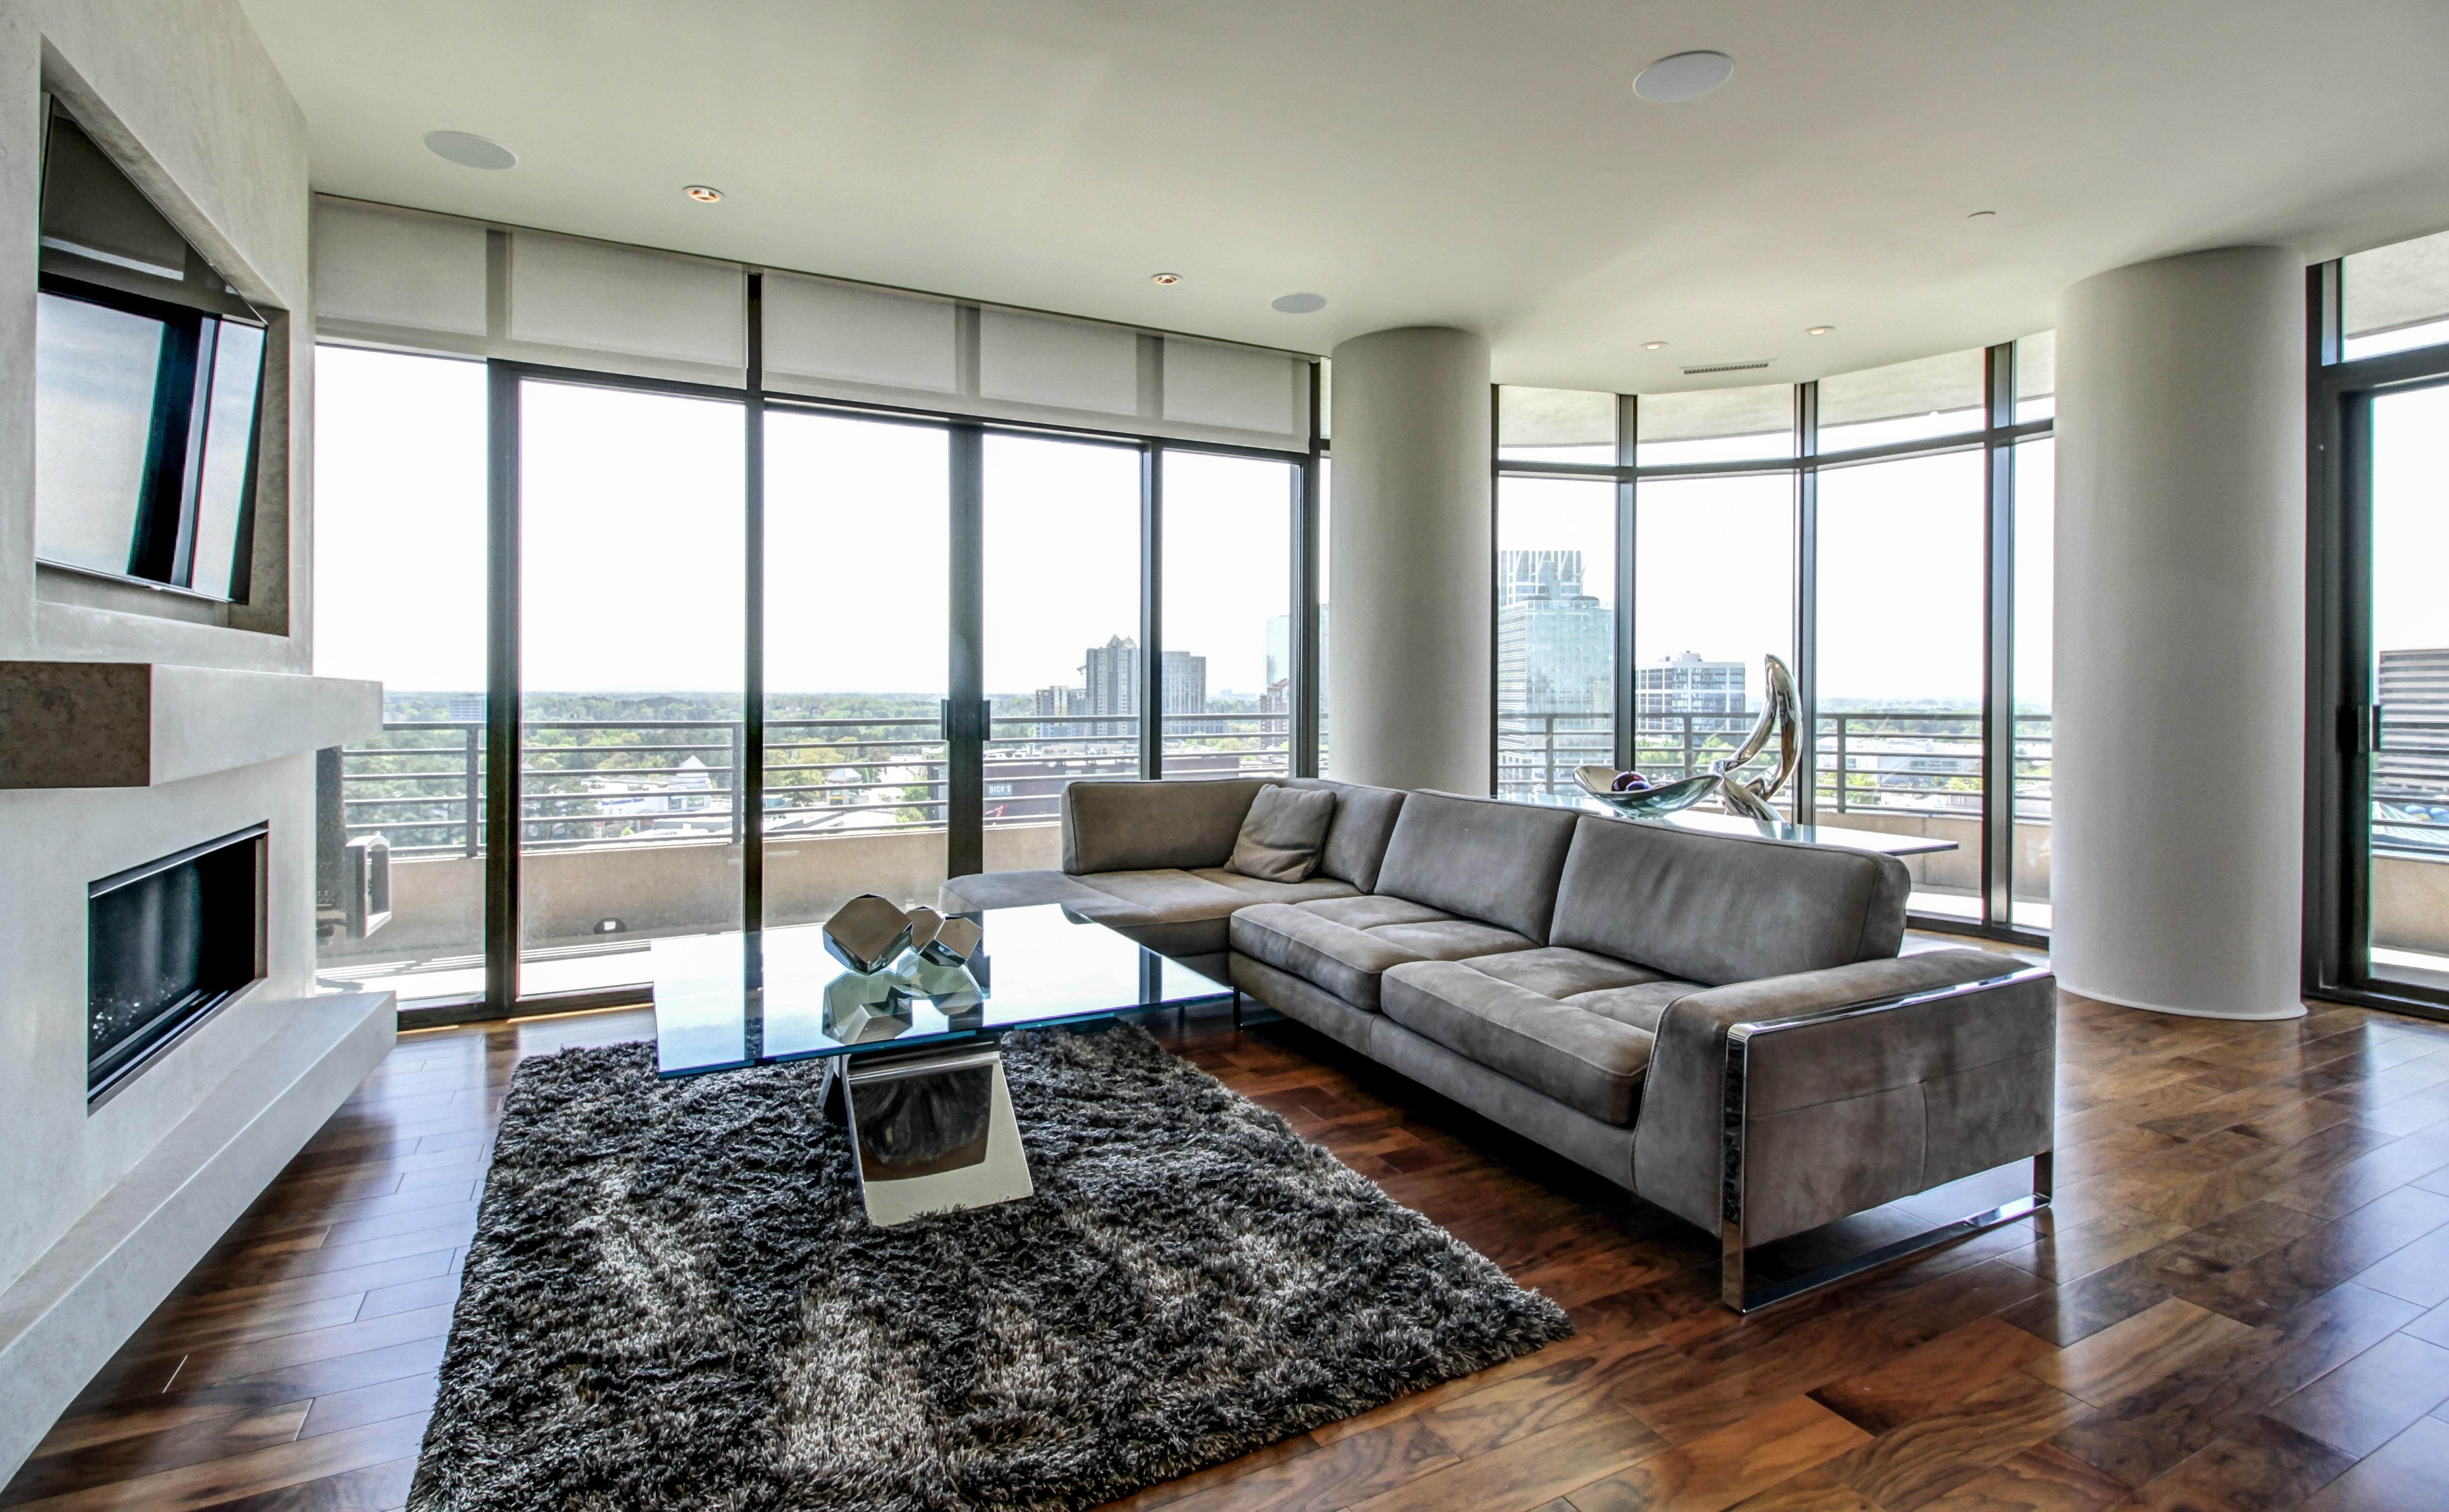 Condominium for Sale at Perfect Buckhead Condo 750 Park Avenue NE, No. 16S Atlanta, Georgia, 30326 United States